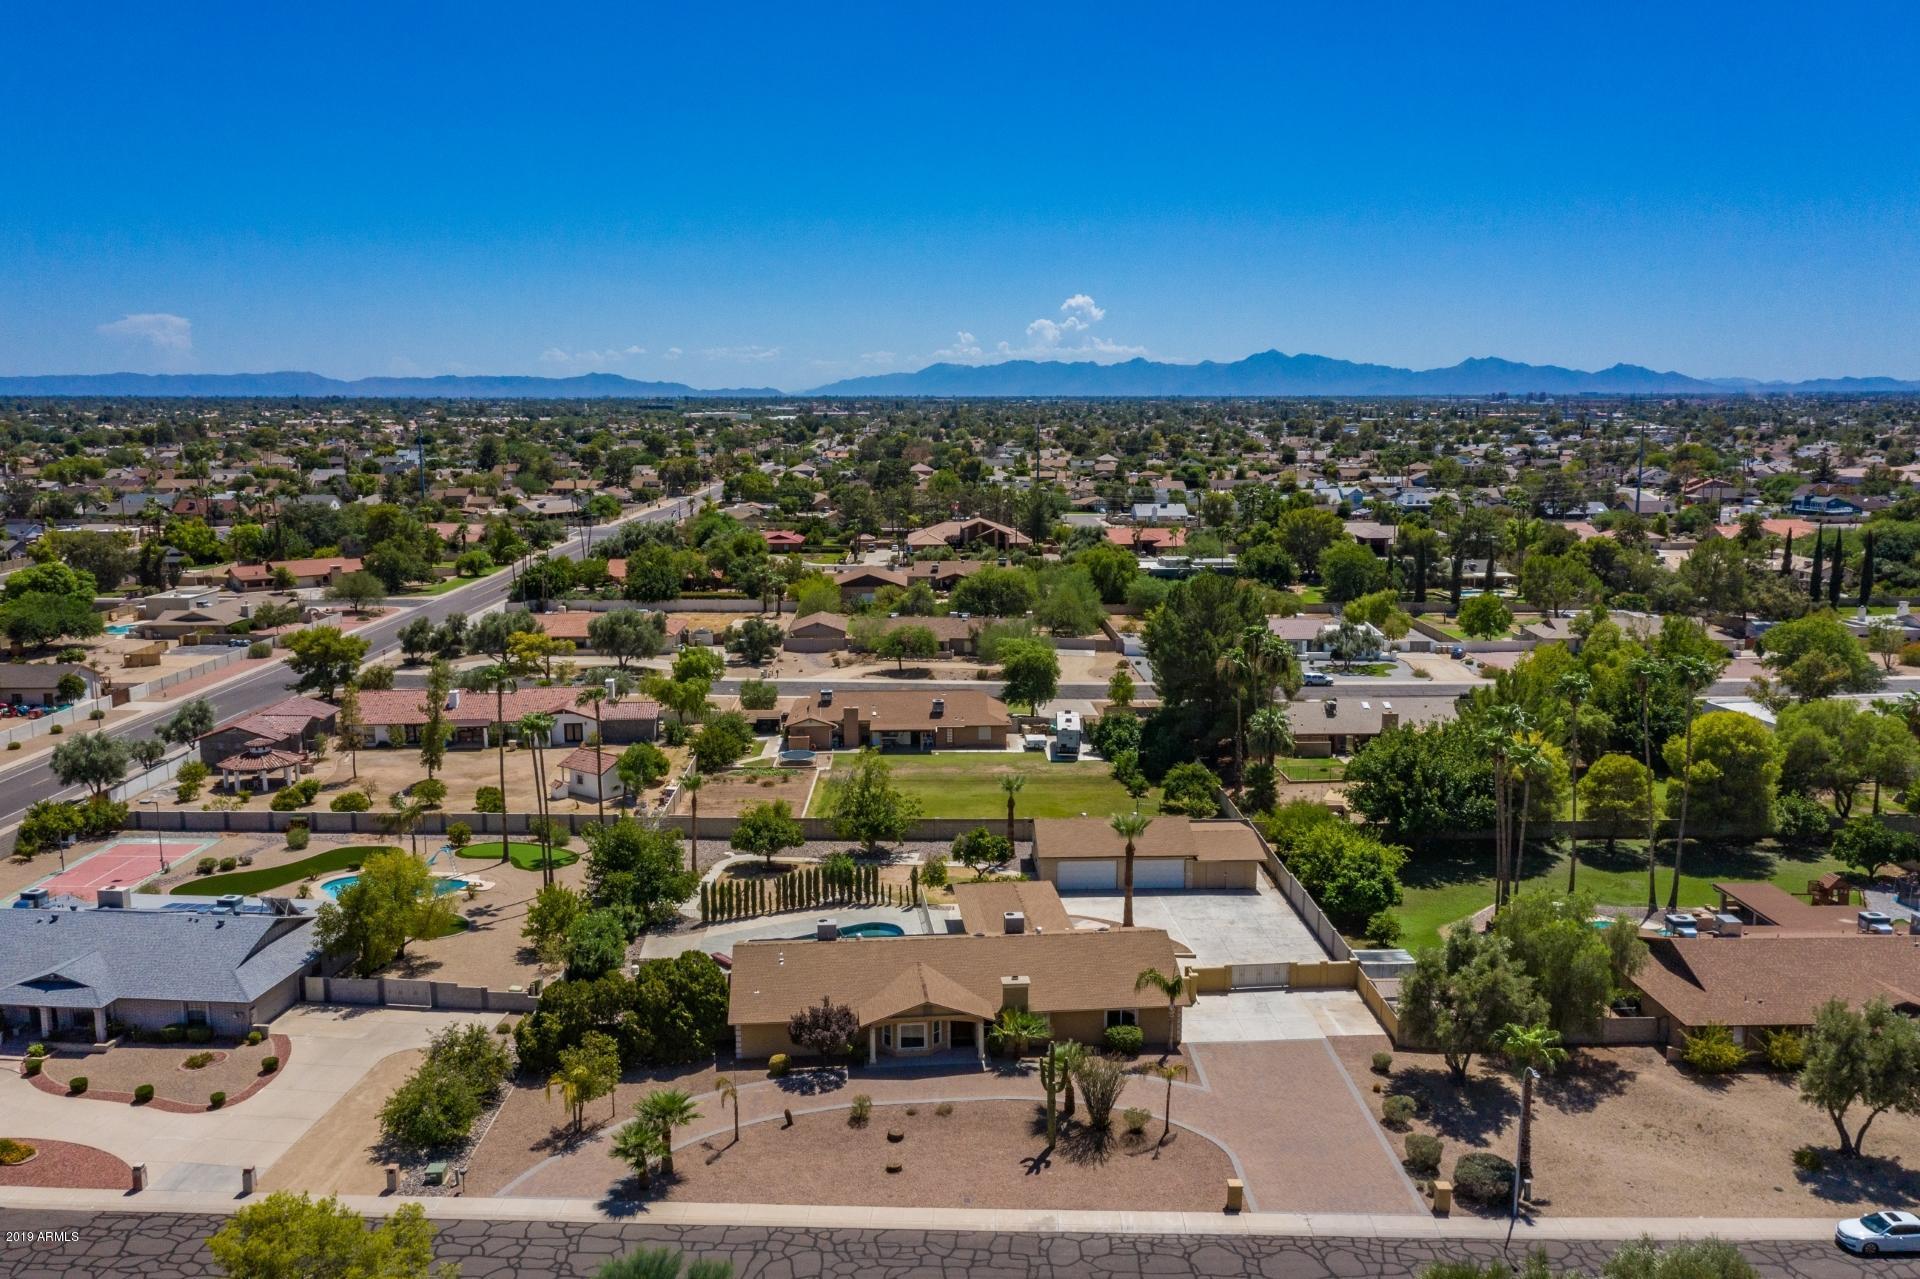 MLS 5971476 6313 W LARKSPUR Drive, Glendale, AZ 85304 Glendale AZ North Glendale